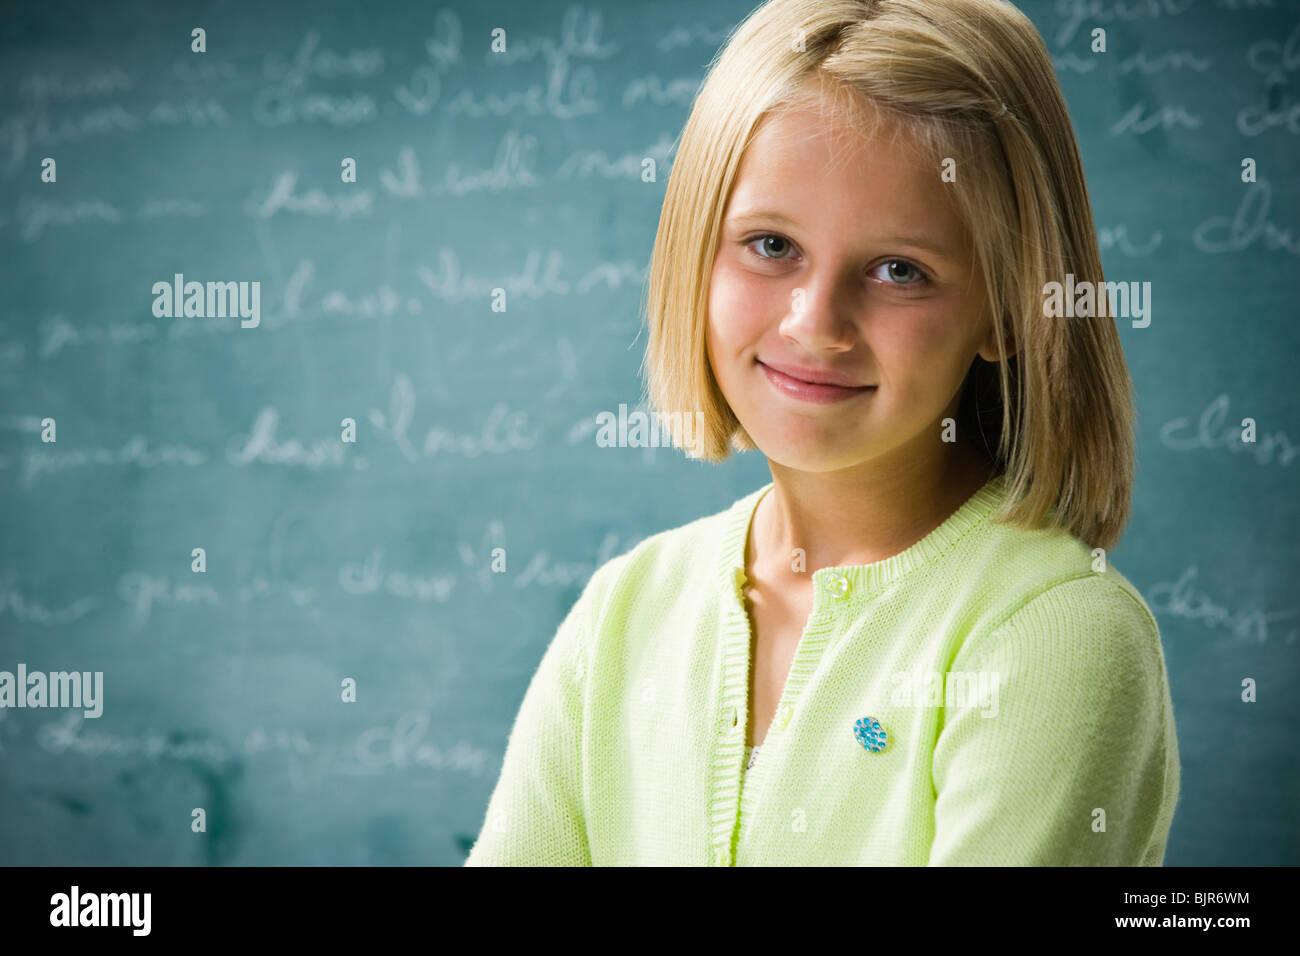 Girl in classroom - Stock Image